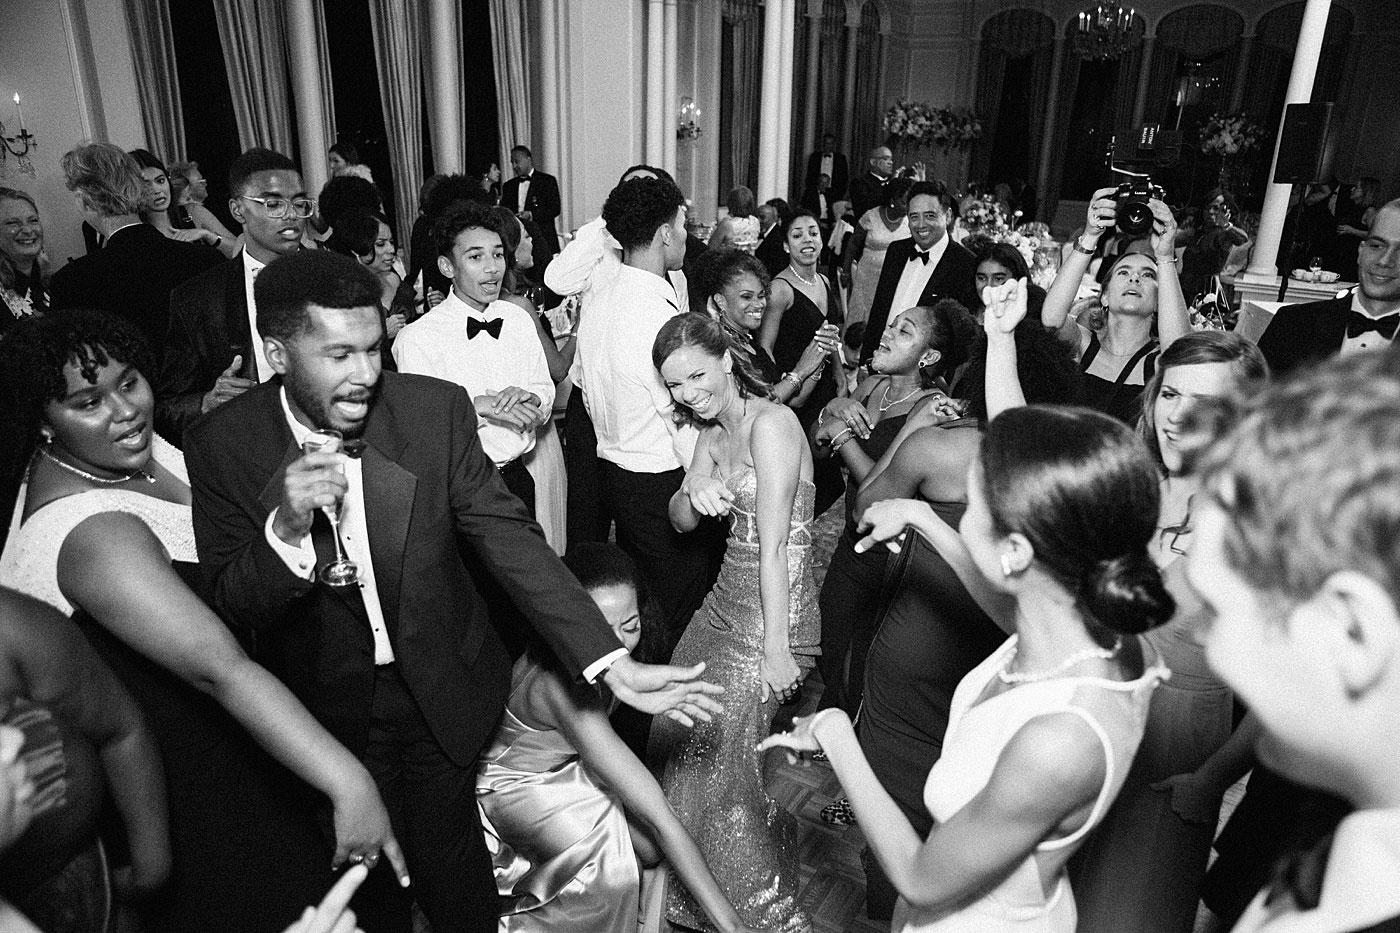 wedding dancing